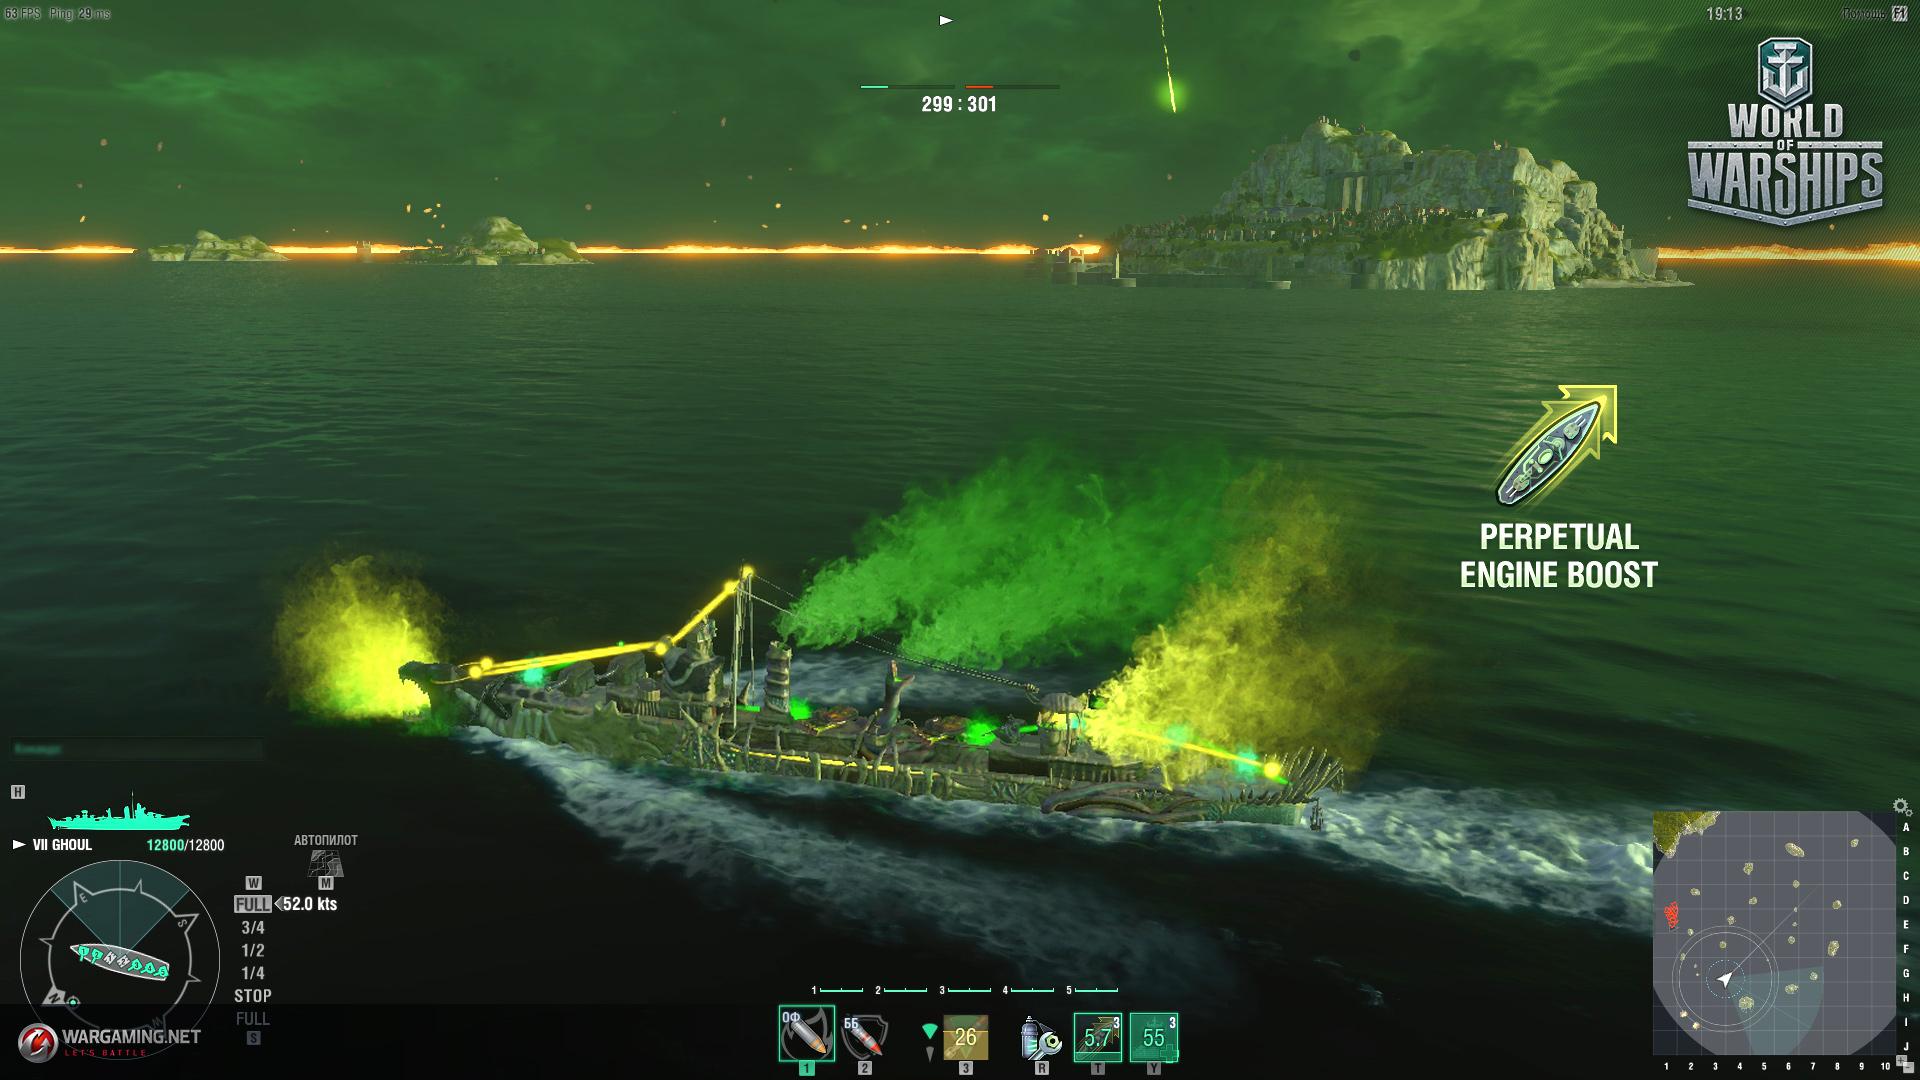 Twilight Battle: More Ships! | World of Warships